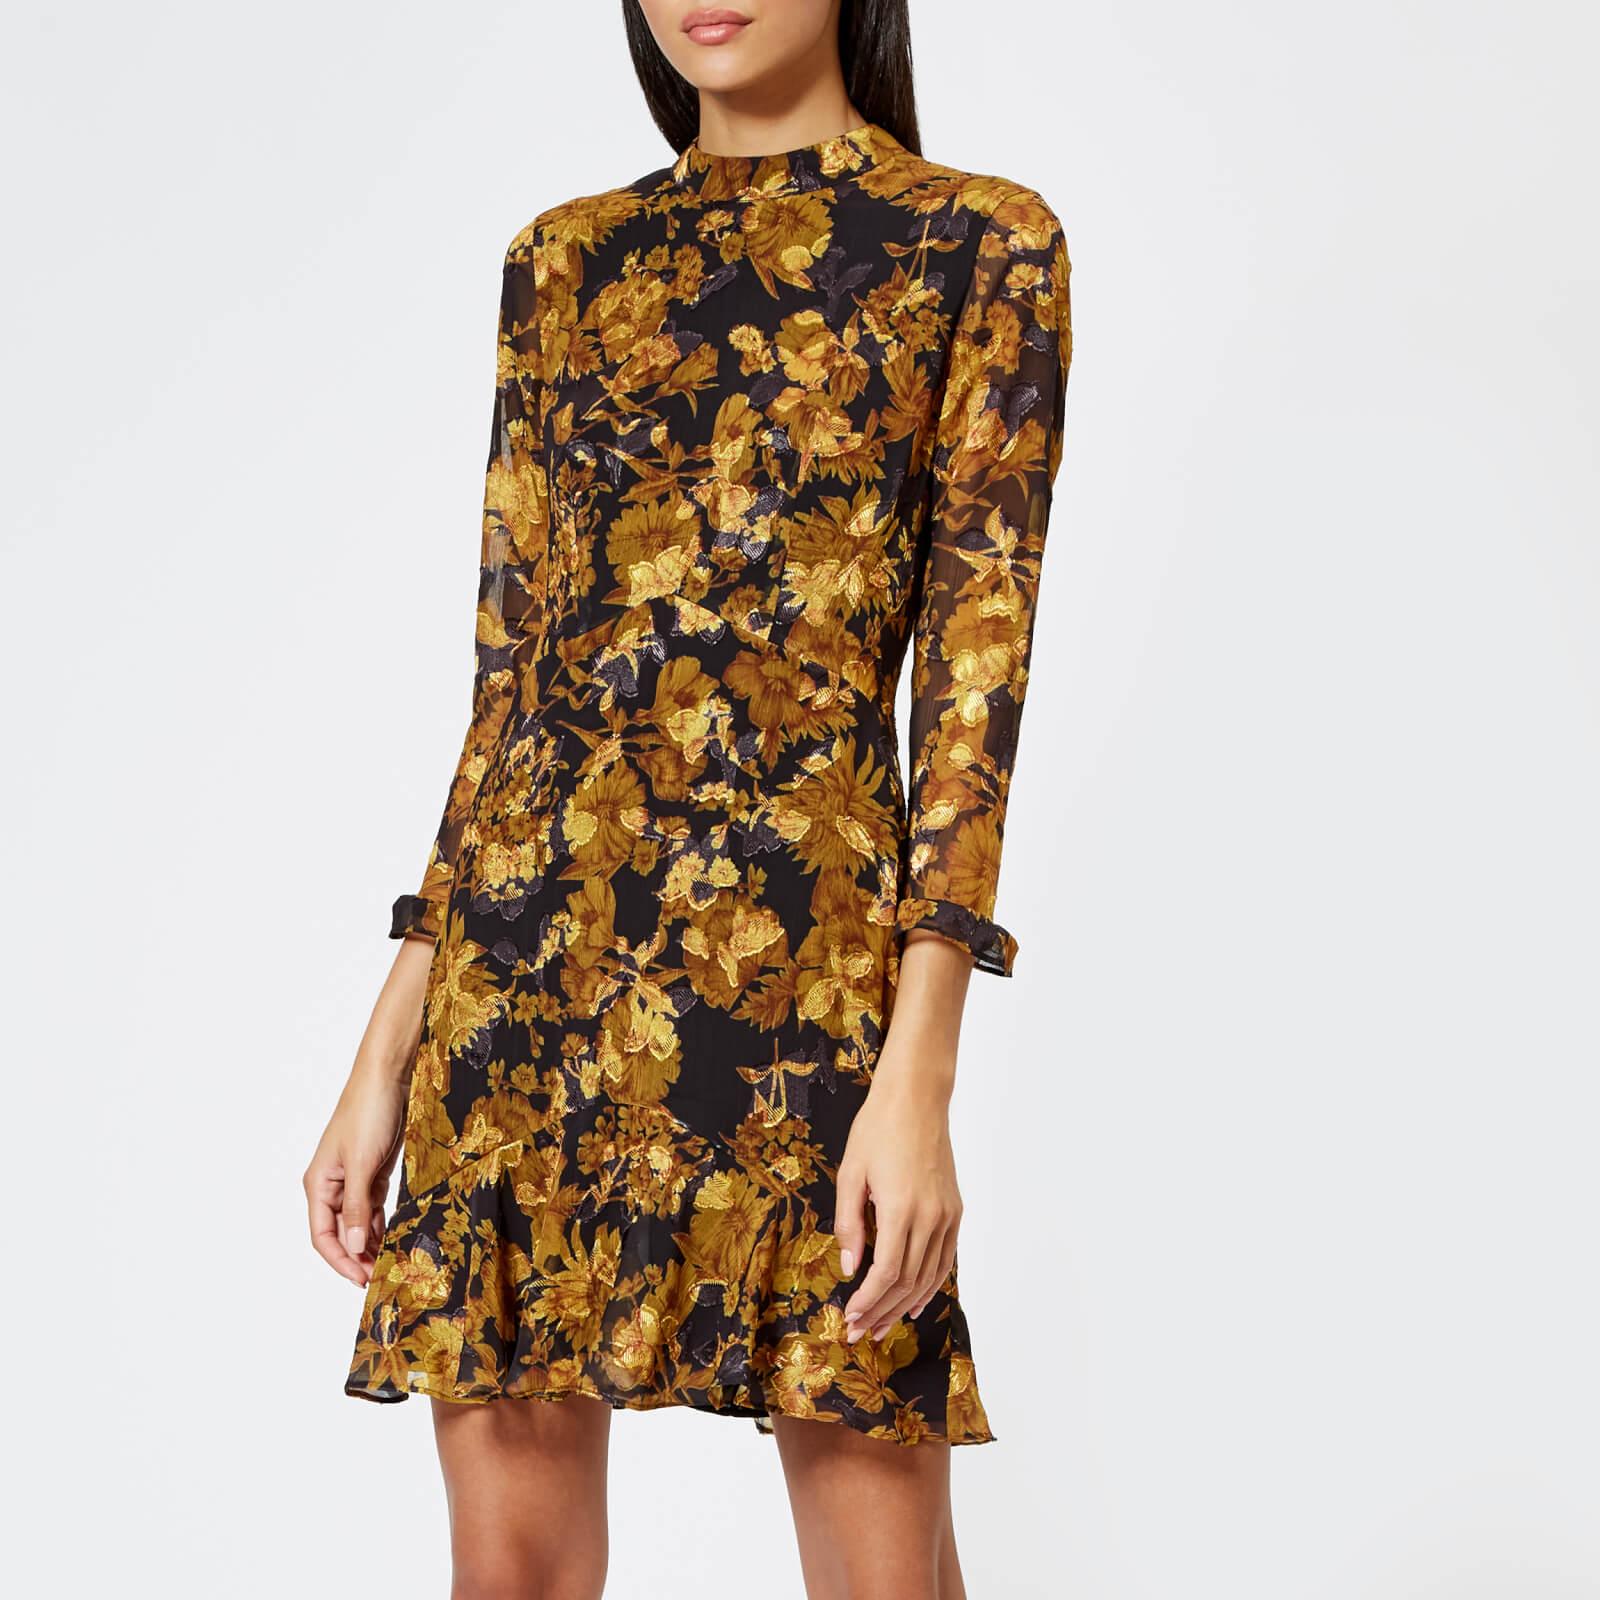 Whistles Women's Mackintosh Print Eleanor Dress - Yellow/Multi - UK 12 - Yellow